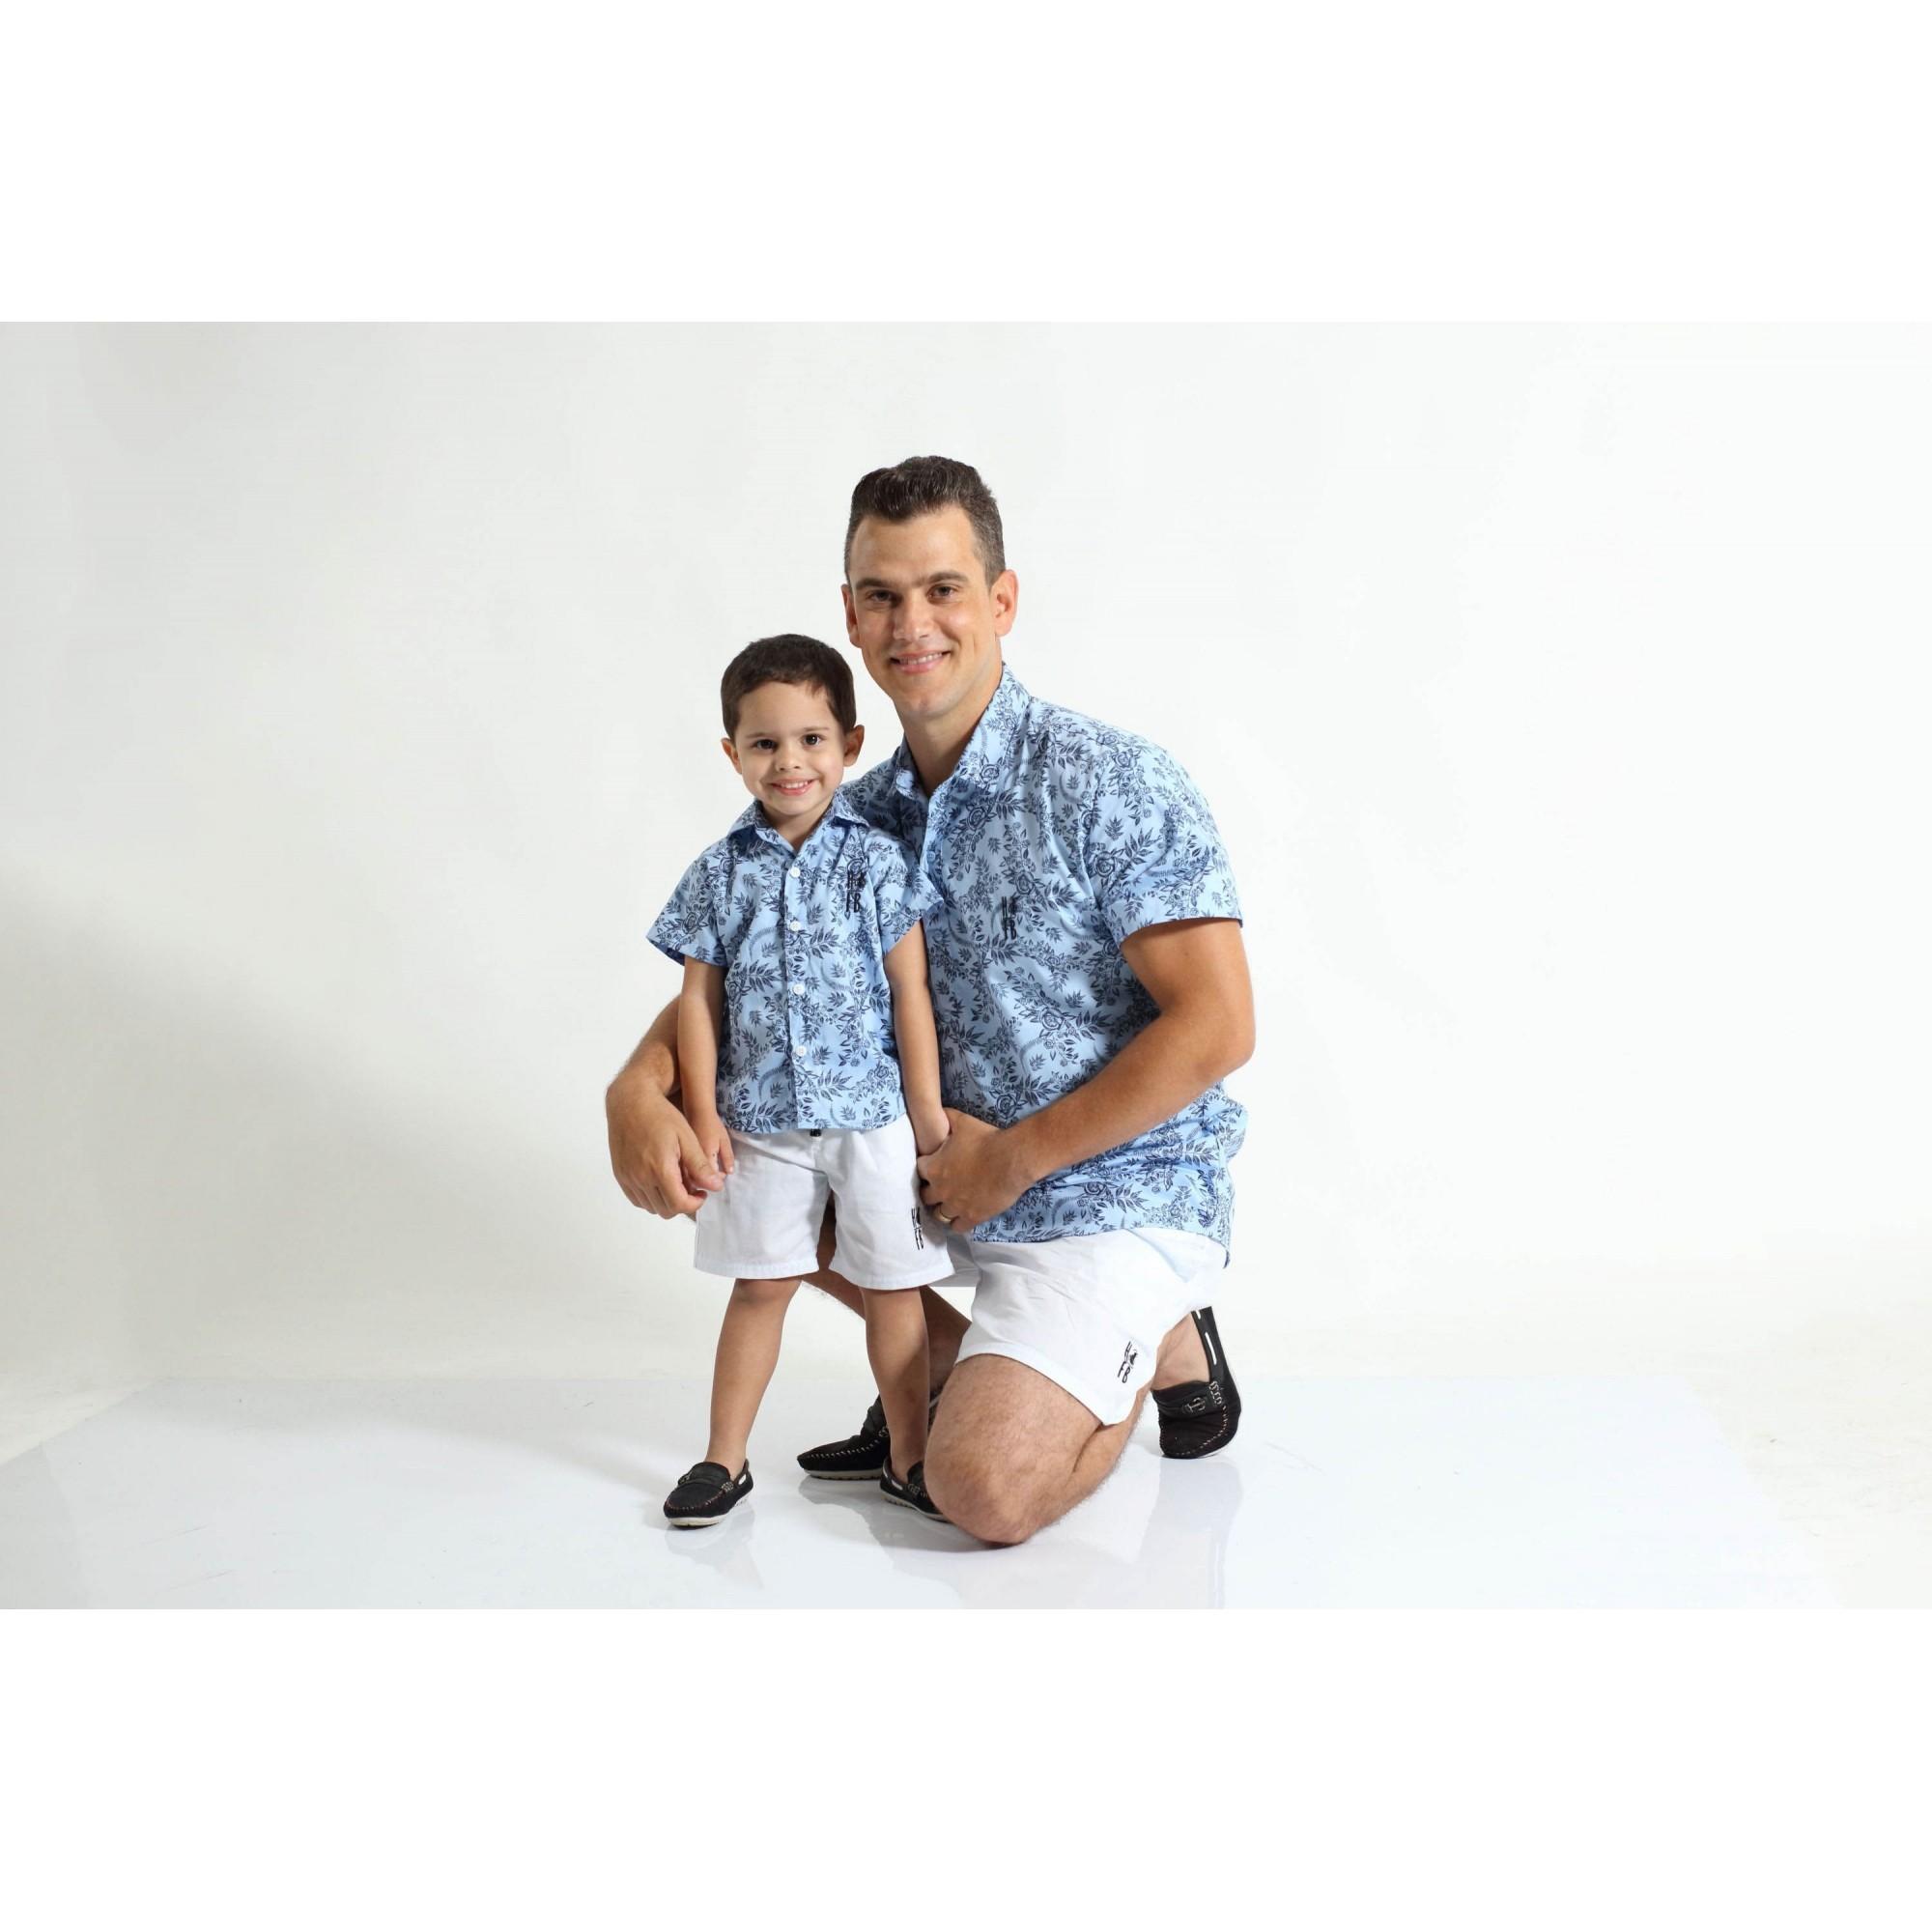 PAI E FILHO > Kit 02 Camisas Manga Curta Azul Floral  [Coleção Tal Pai Tal Filho]  - Heitor Fashion Brazil